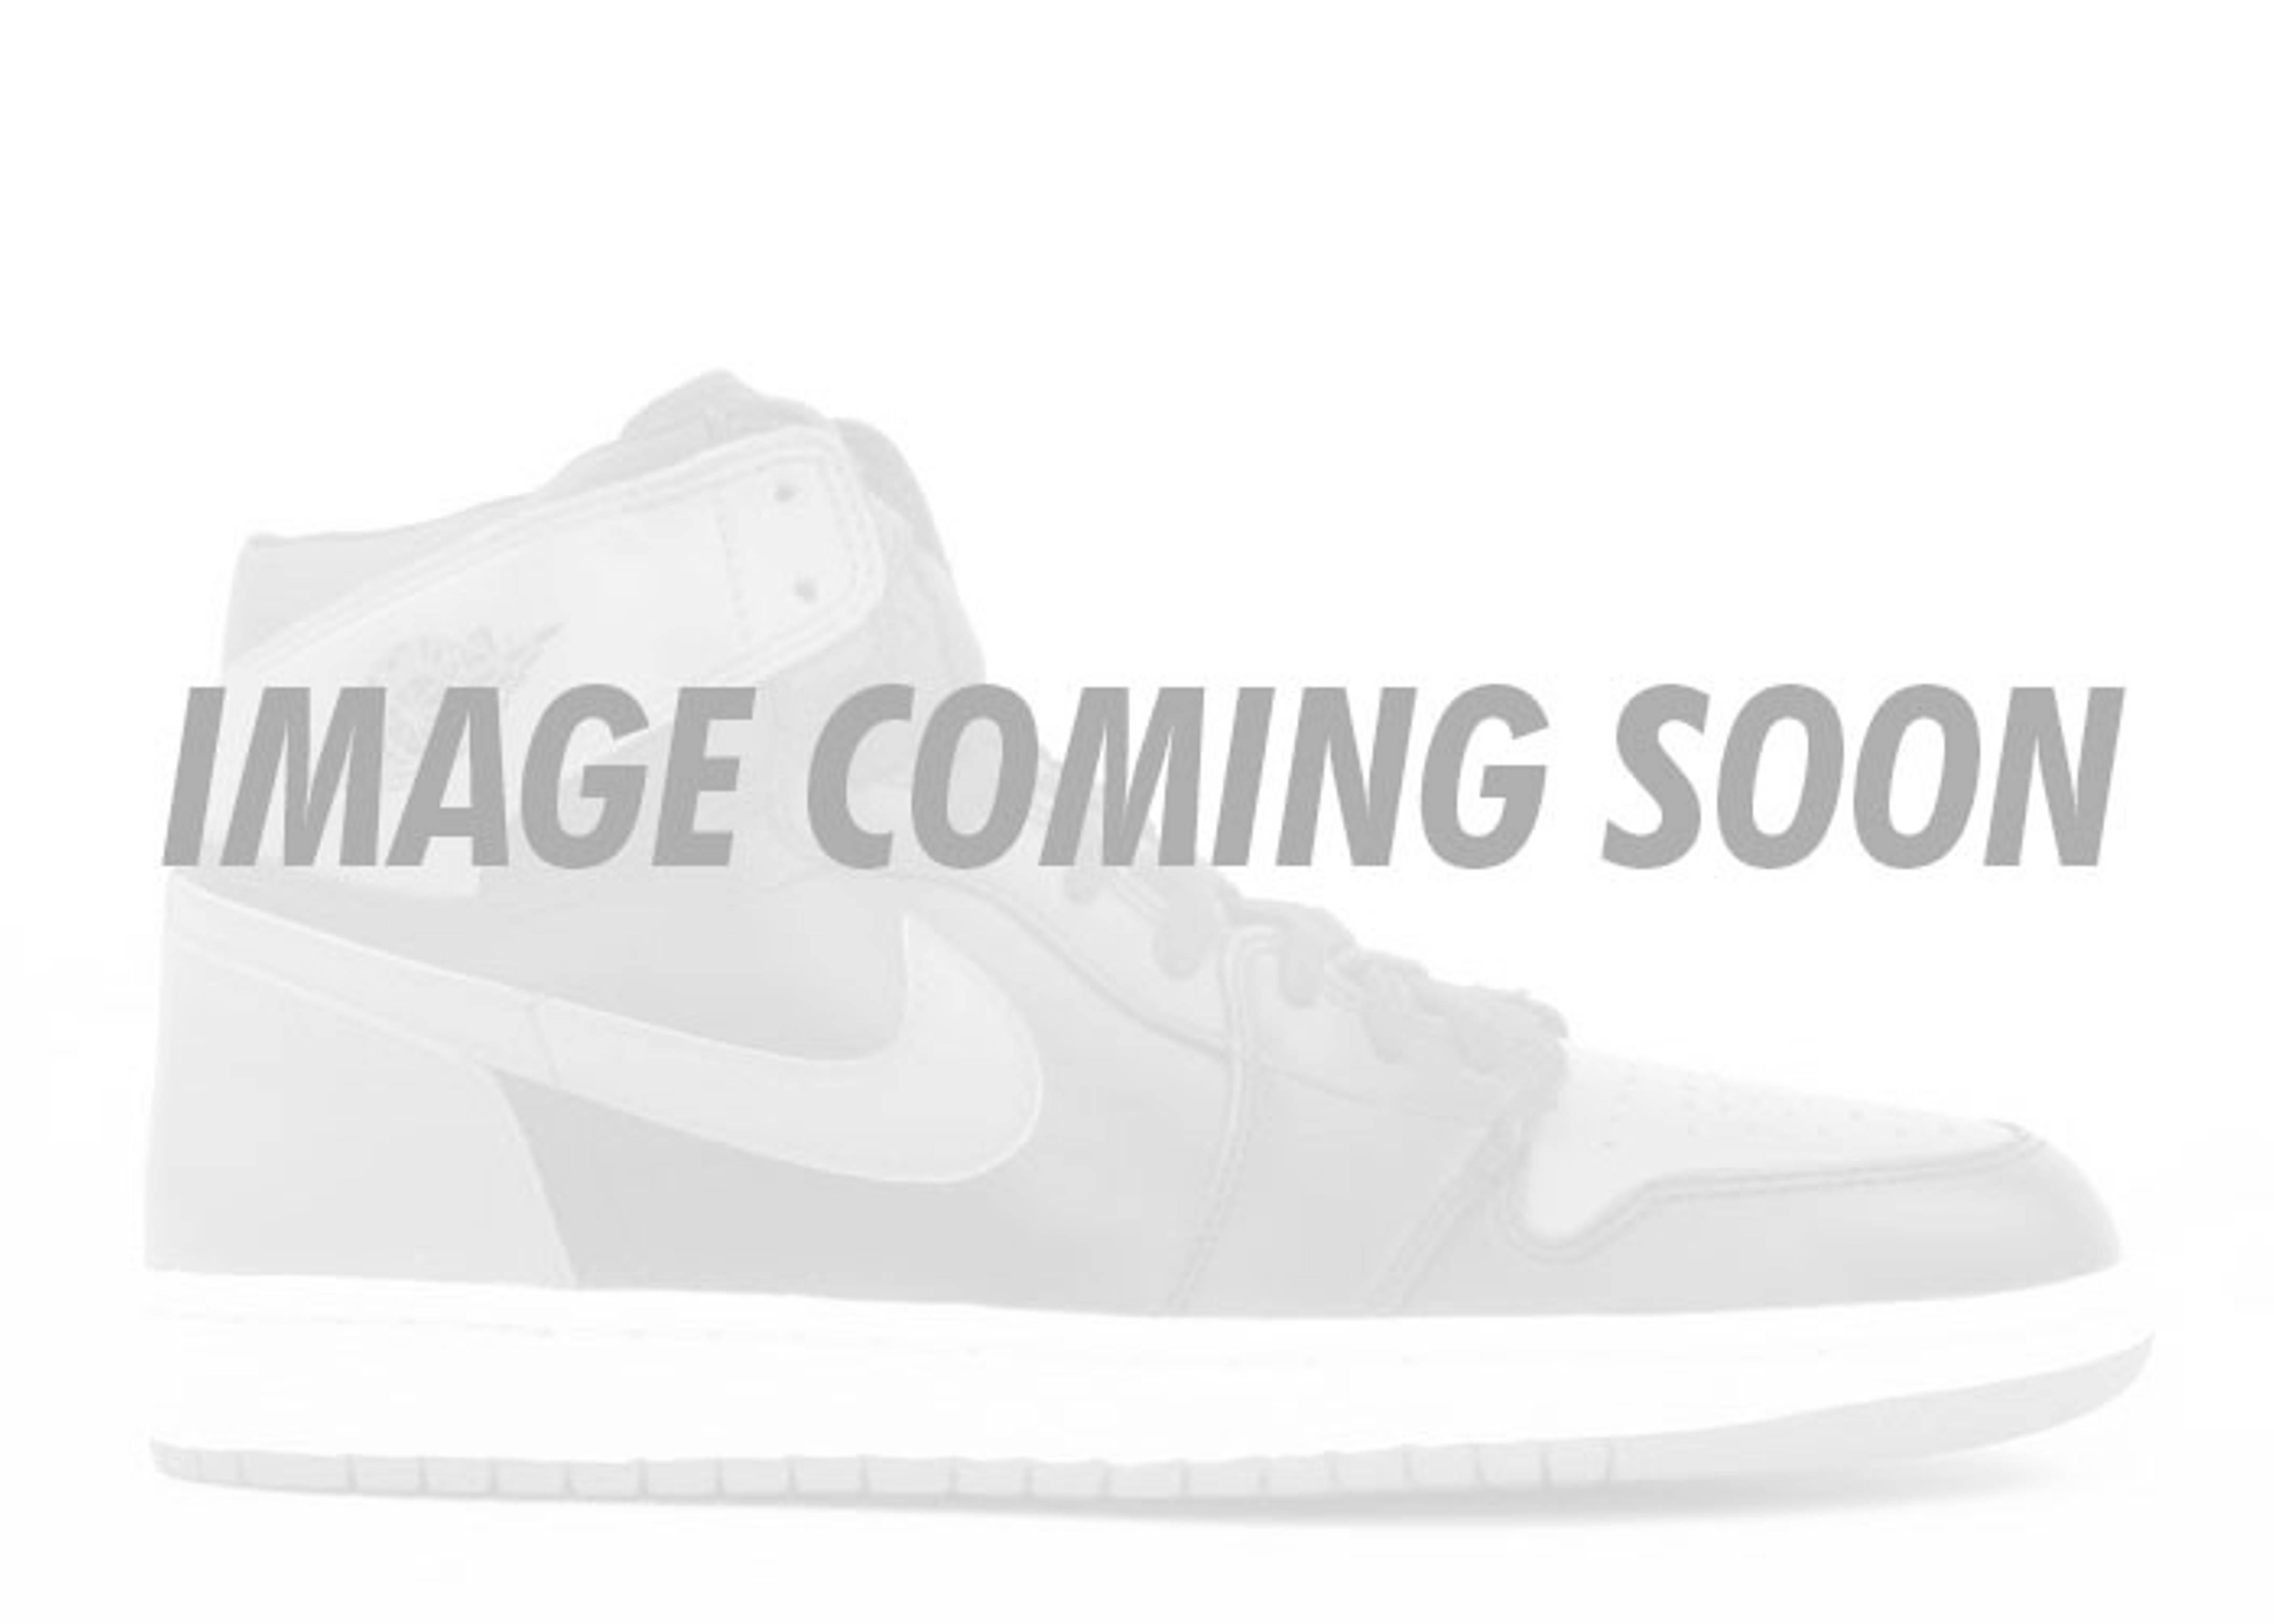 new style ee24d e0977 Air Flow - Nike - 458206 301 - lush teal vrsty prpl-smmt wht   Flight Club